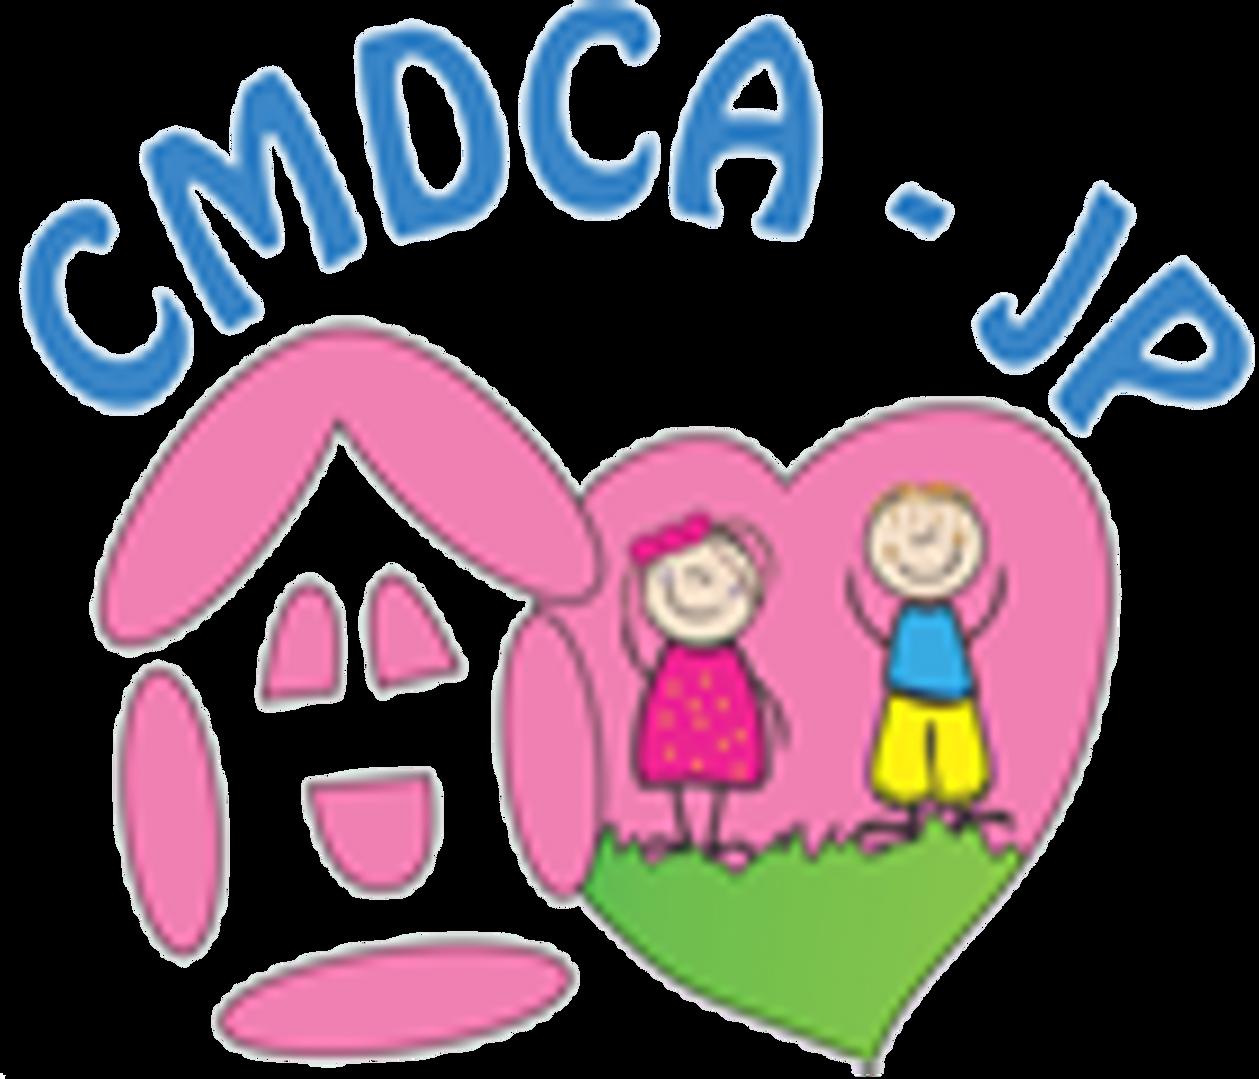 CMDCA OK.png